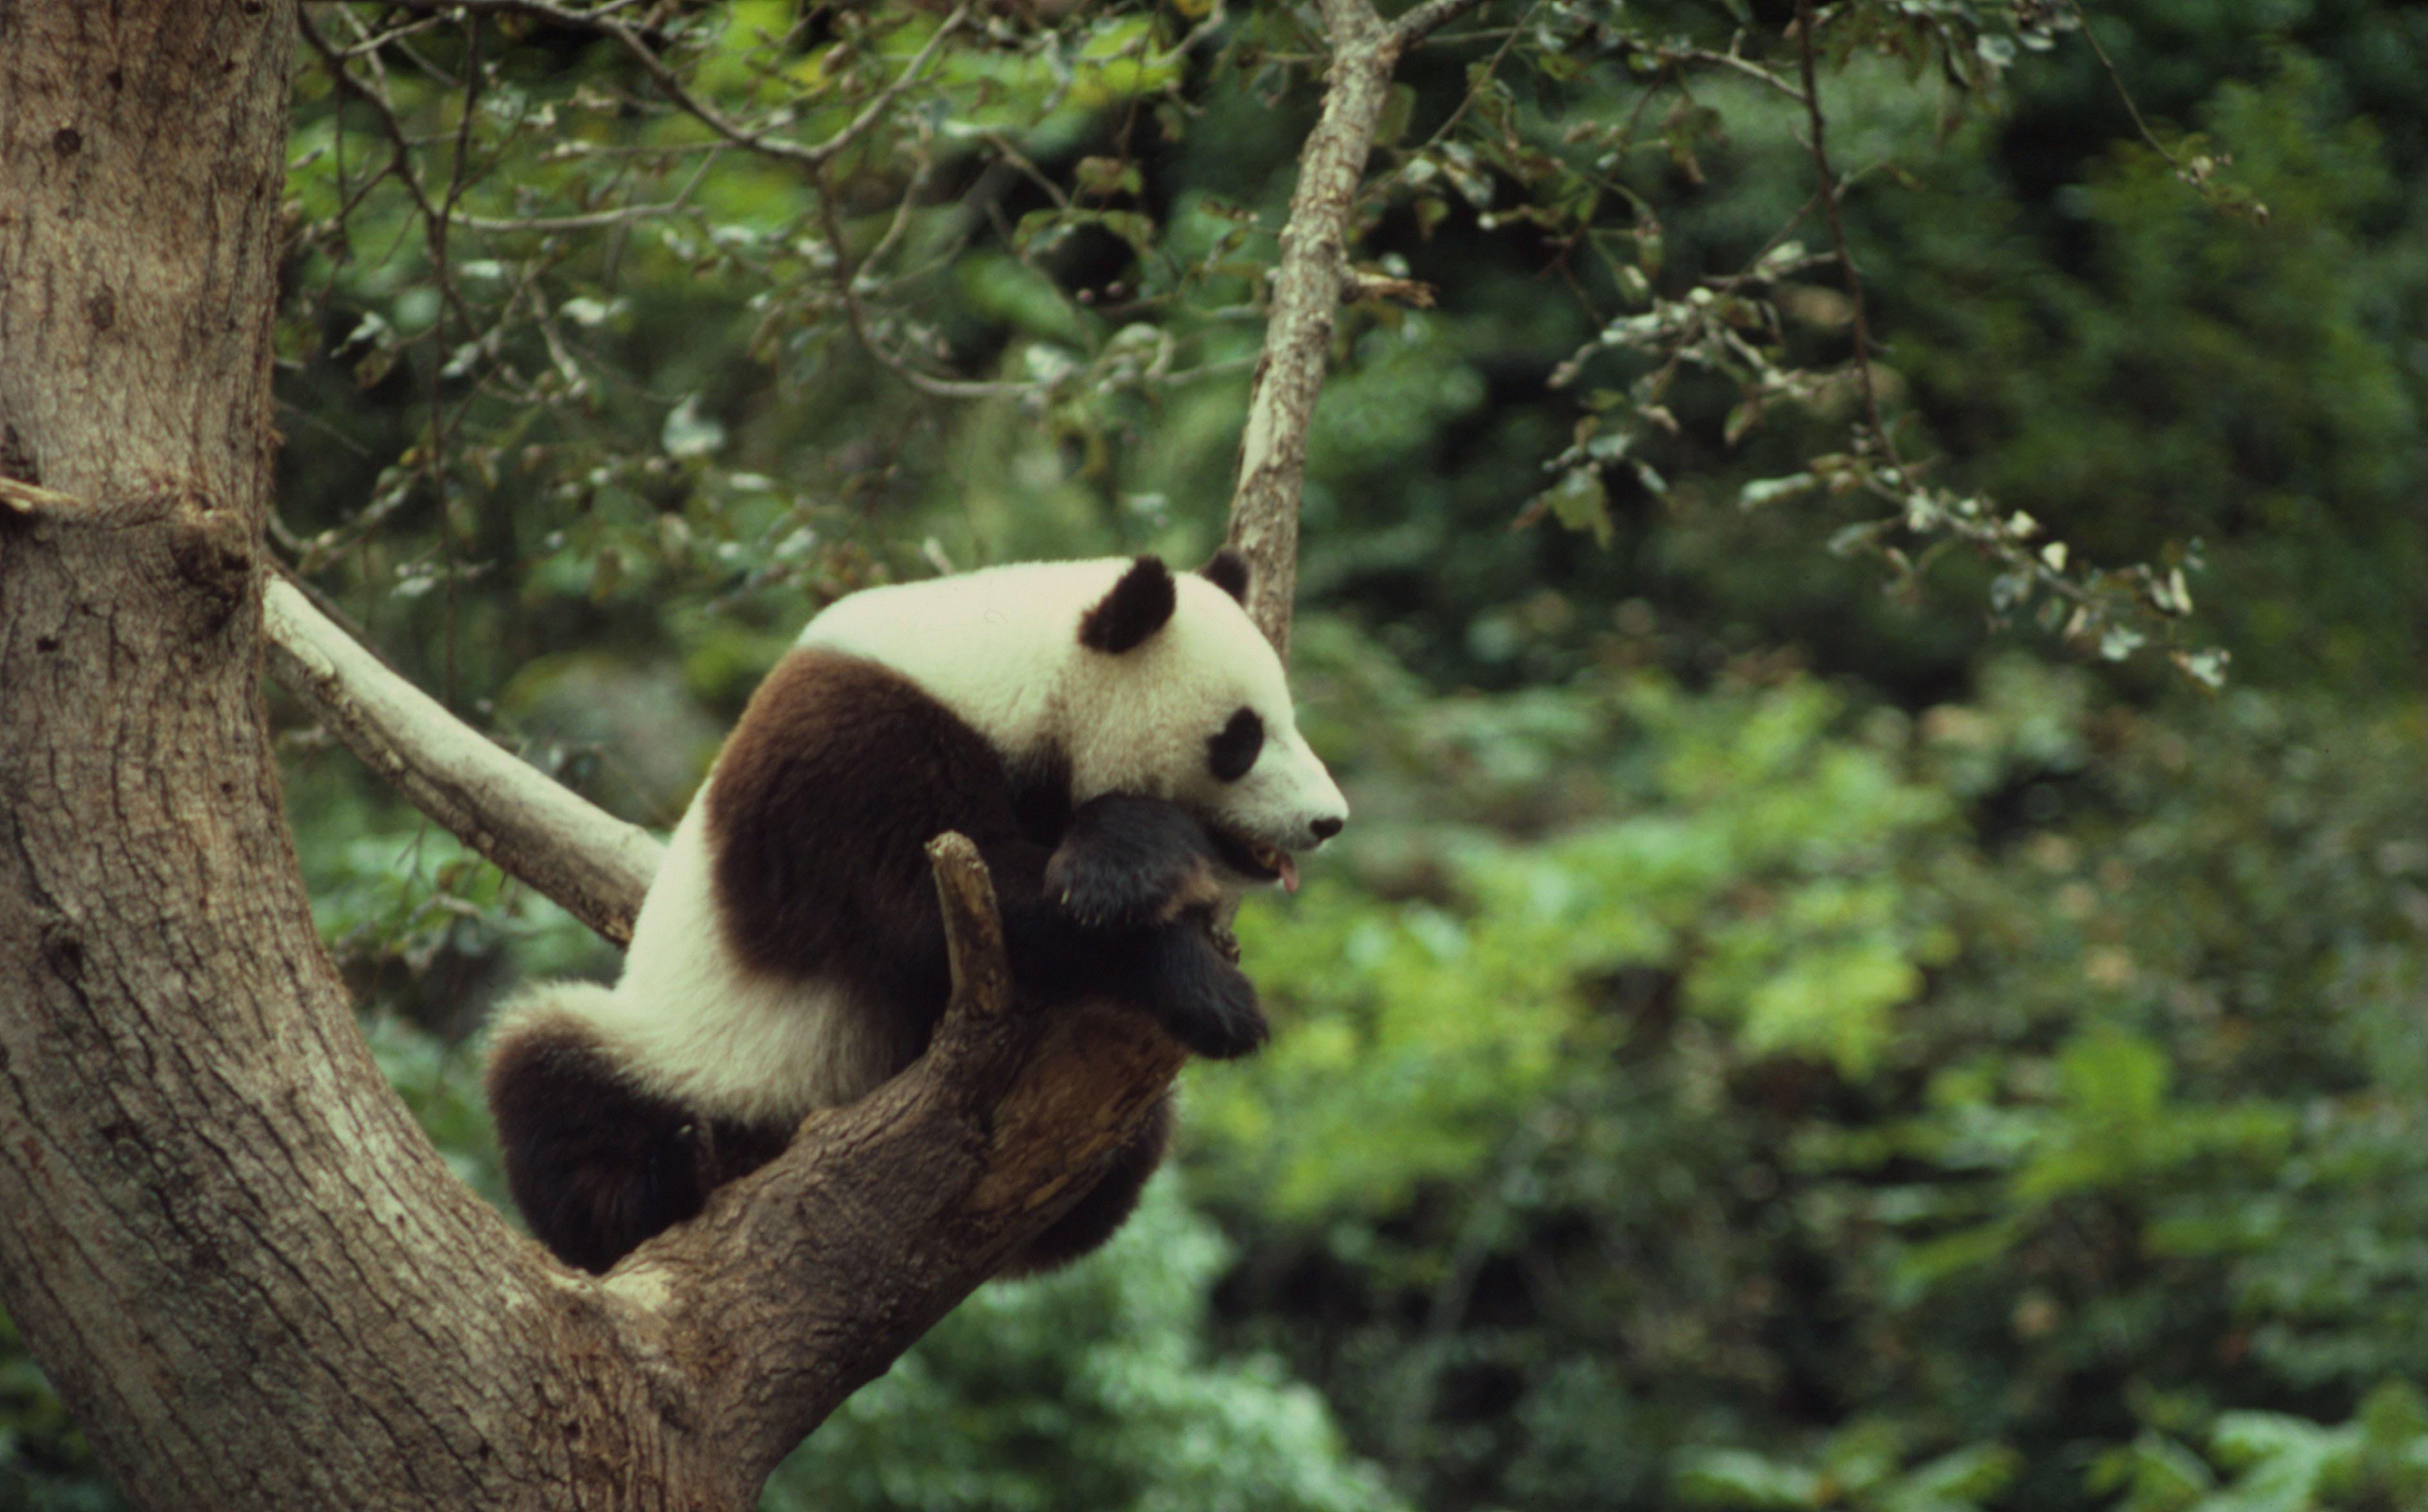 wwf panda forest - photo #9